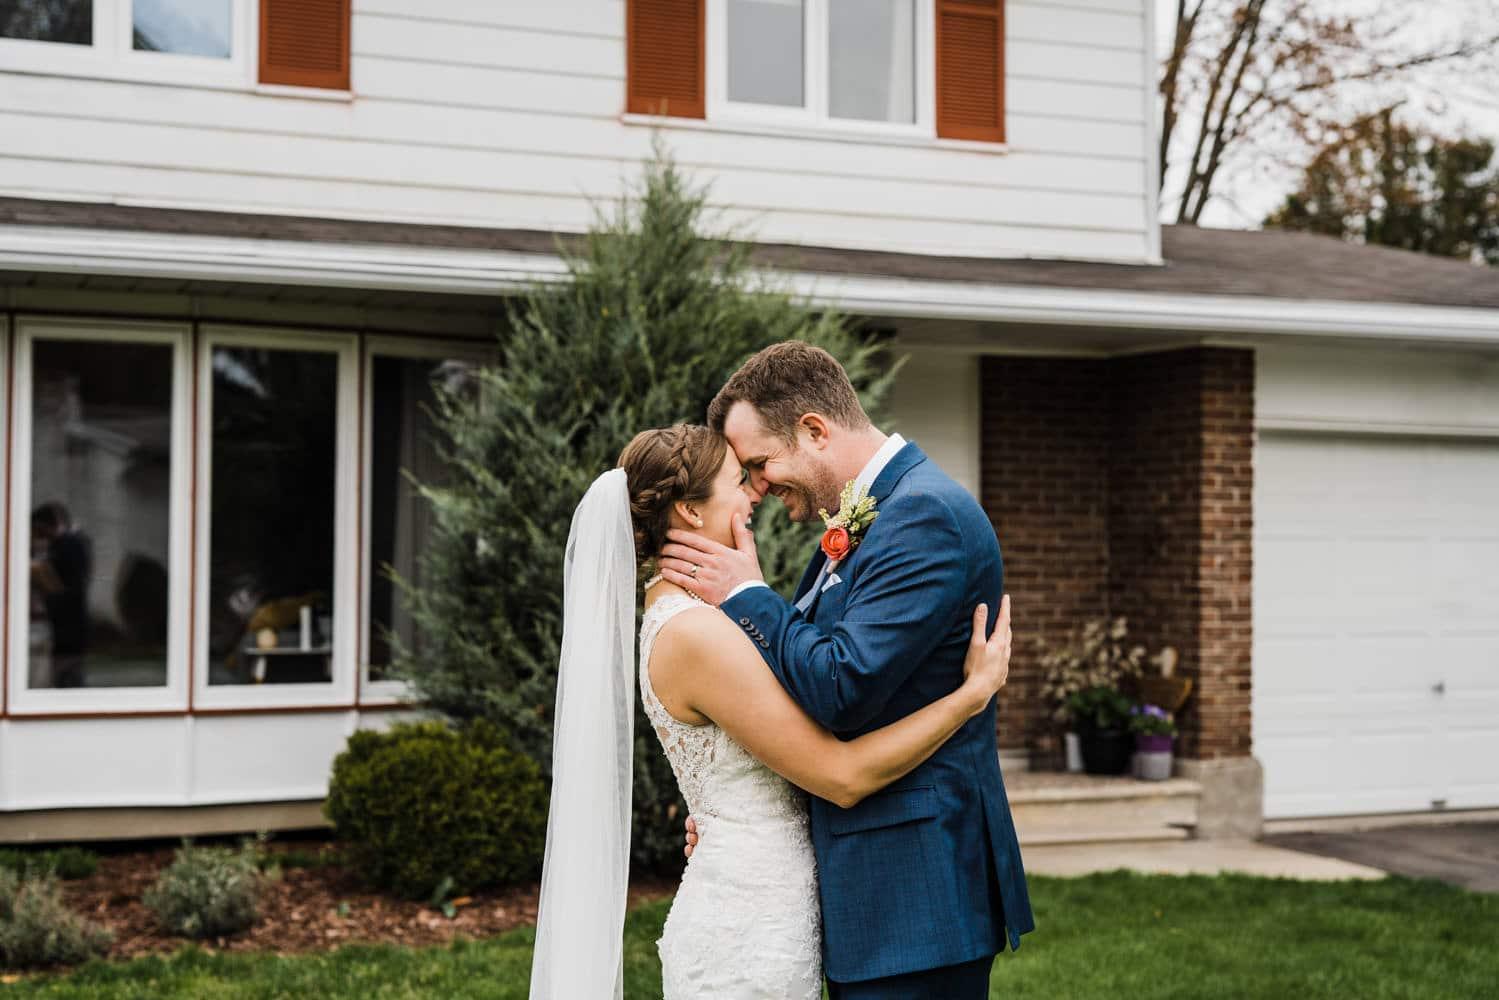 couple laugh after their backyard wedding ceremony - intimate wedding ottawa